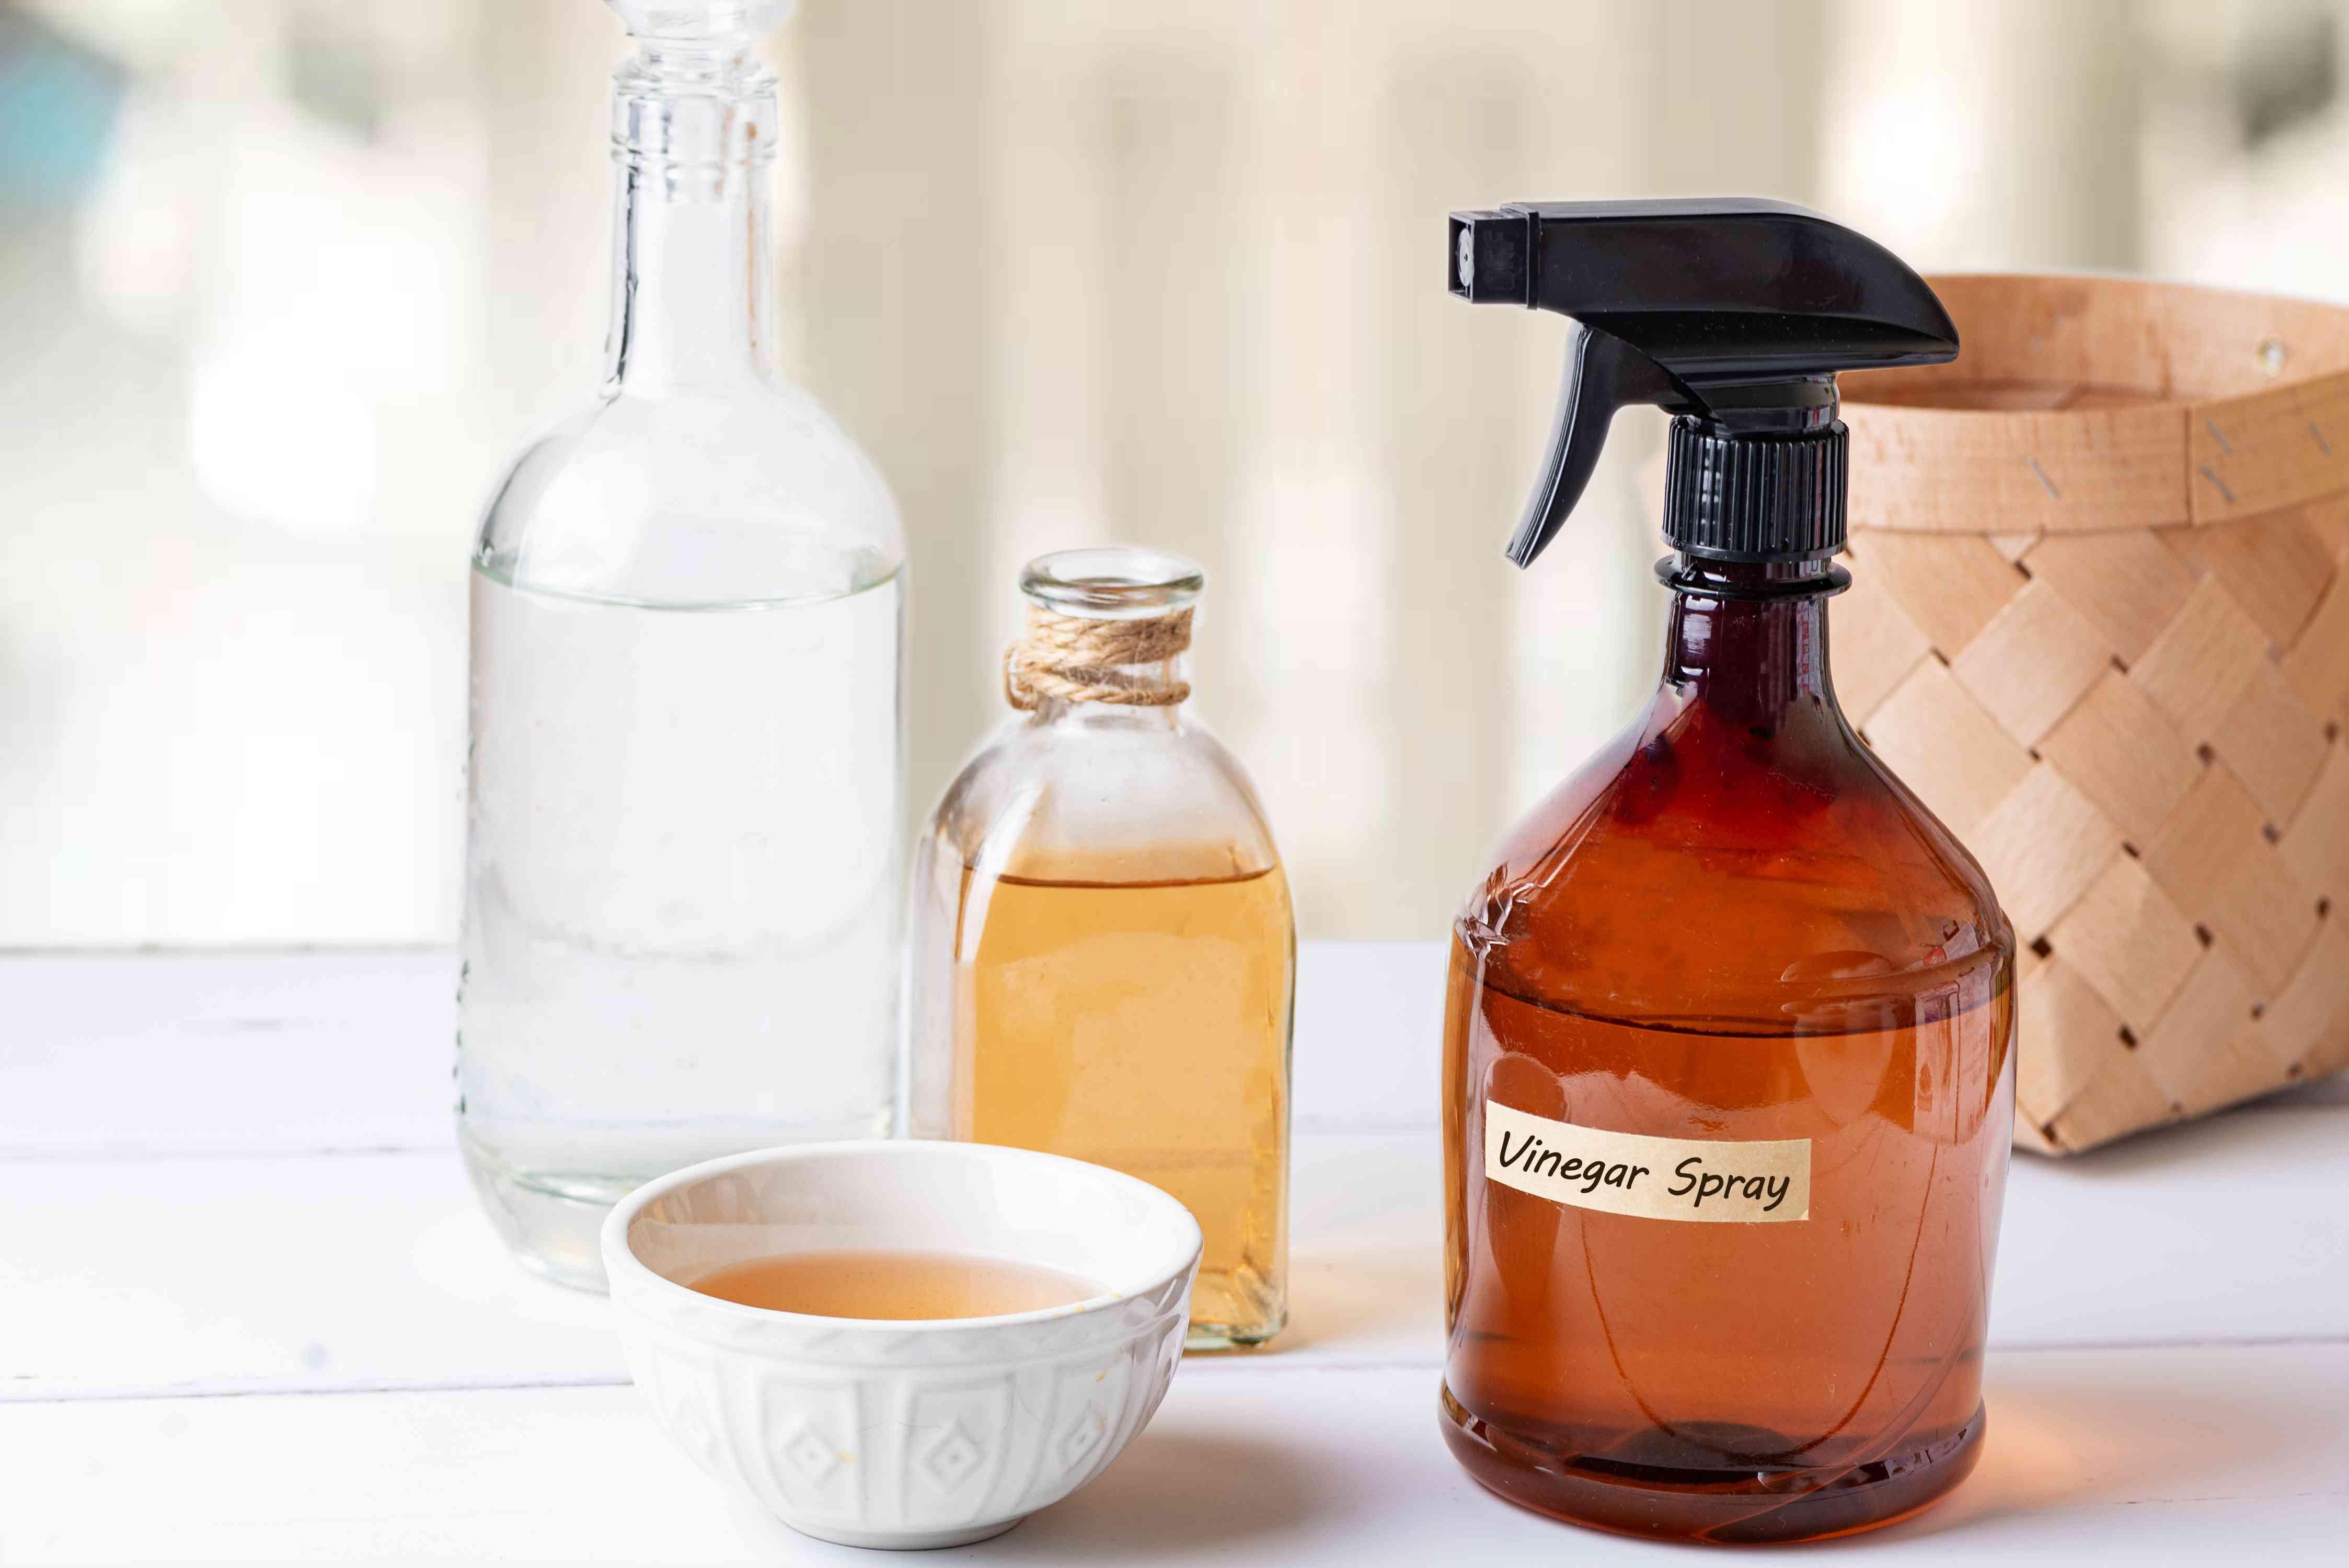 scented vinegar spray